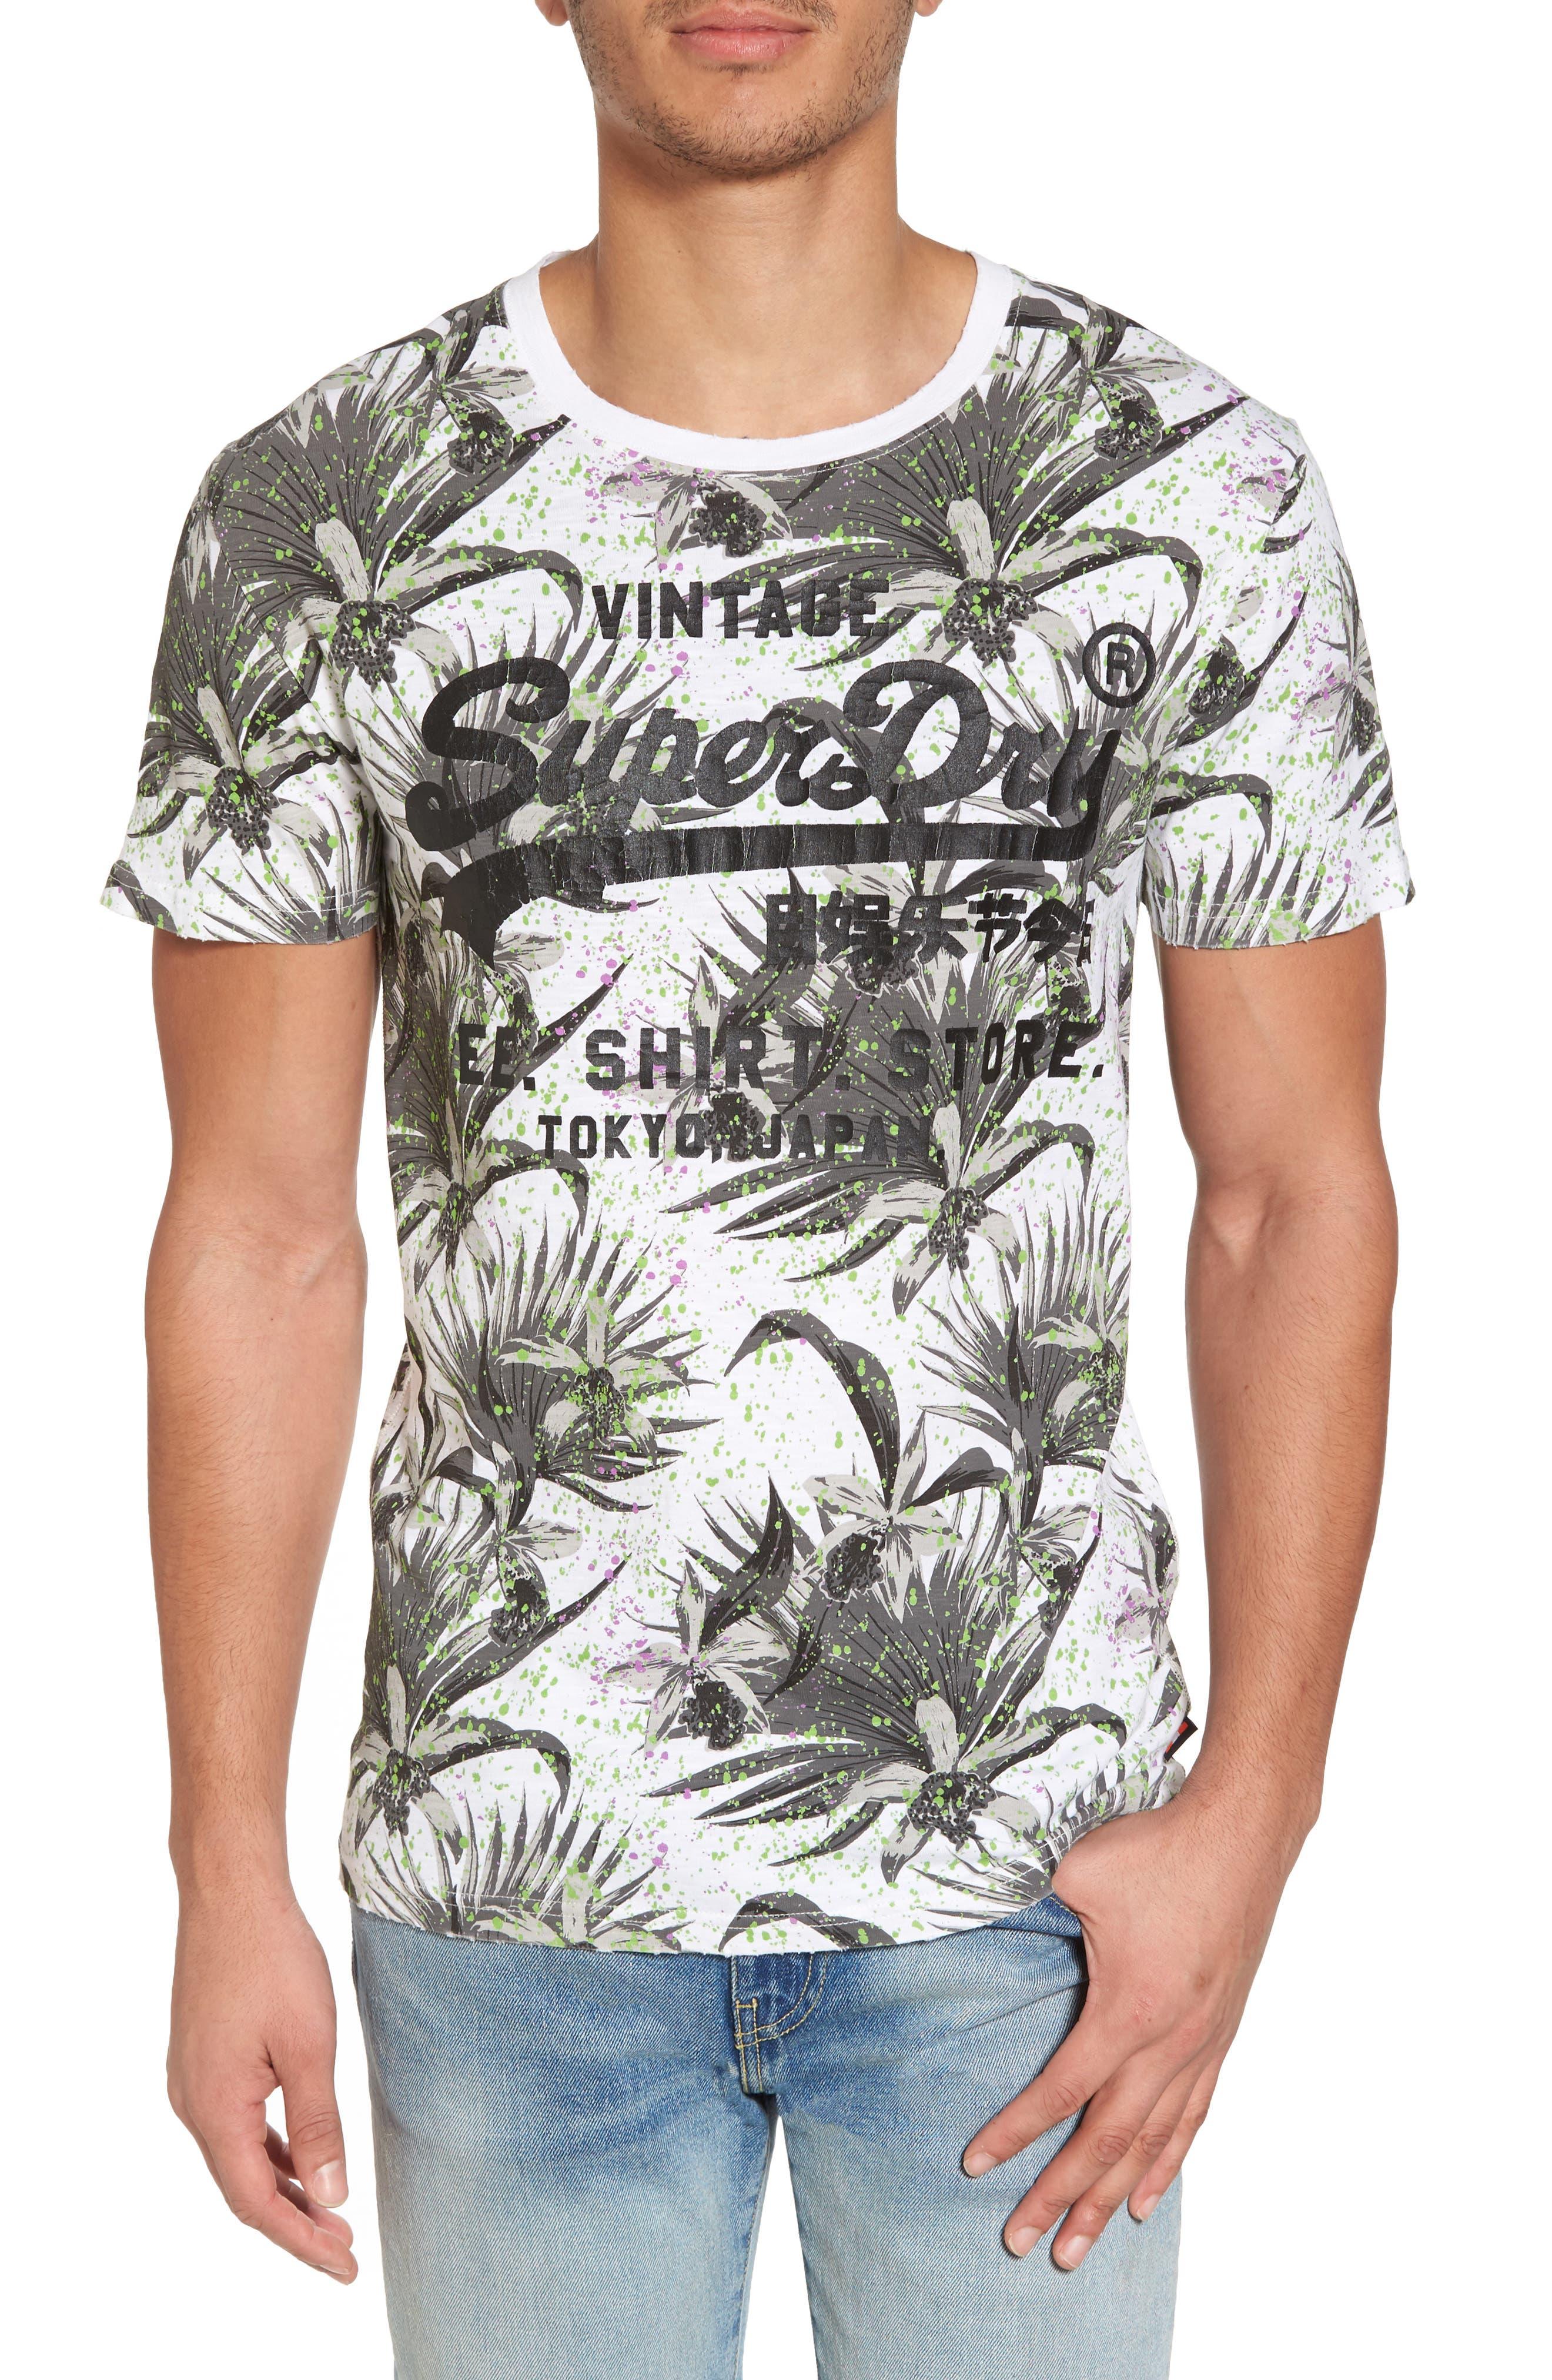 Shirt Shop Aop T-Shirt,                             Main thumbnail 1, color,                             OPTIC